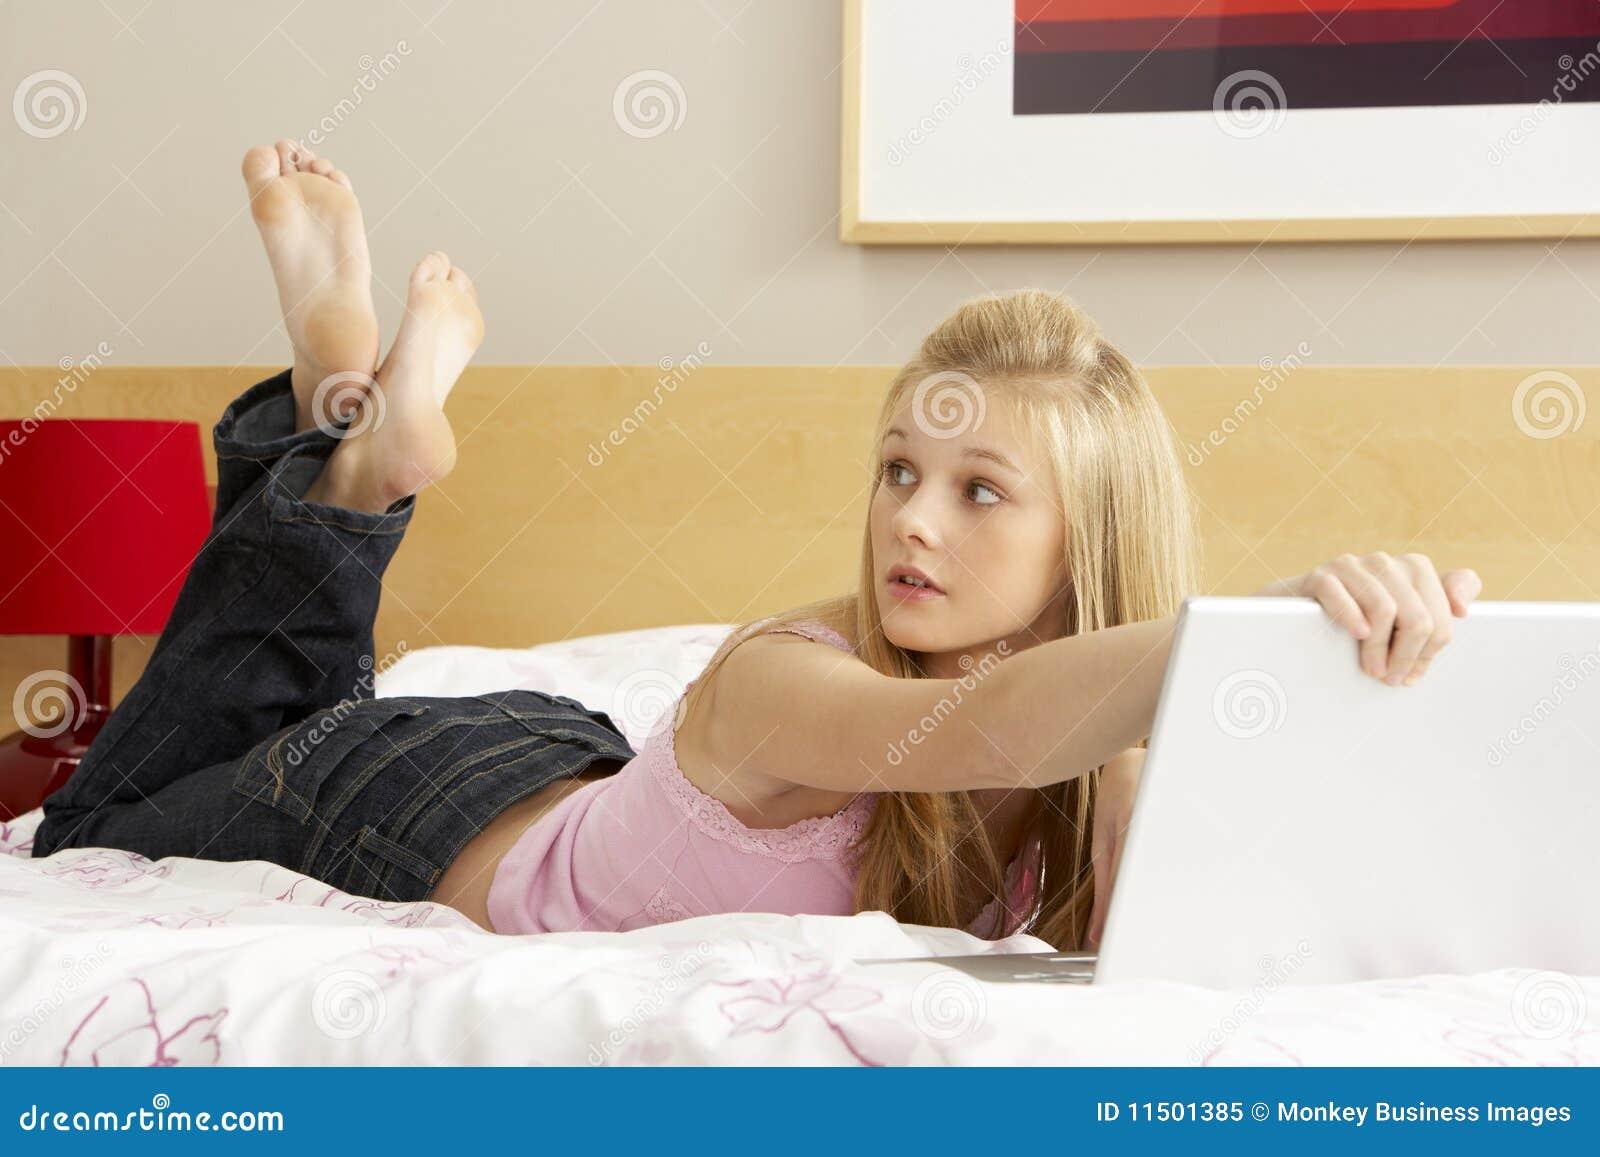 Guilty Teenage Girl Using Laptop In Bedroom Stock Image